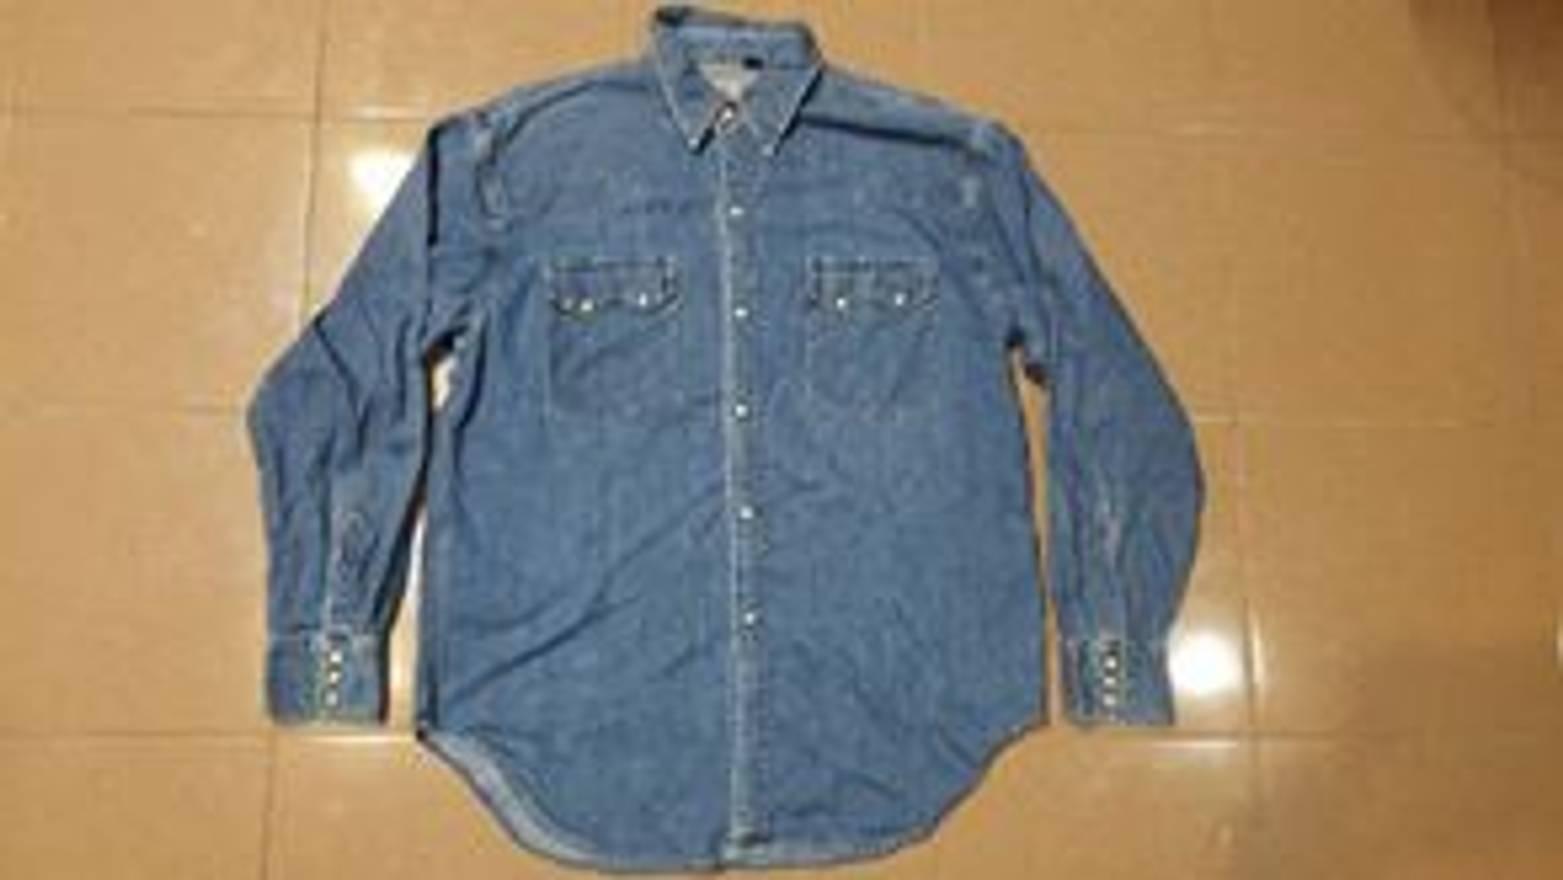 52b8e816e1 Levis Vintage Clothing Western Shirt - BCD Tofu House